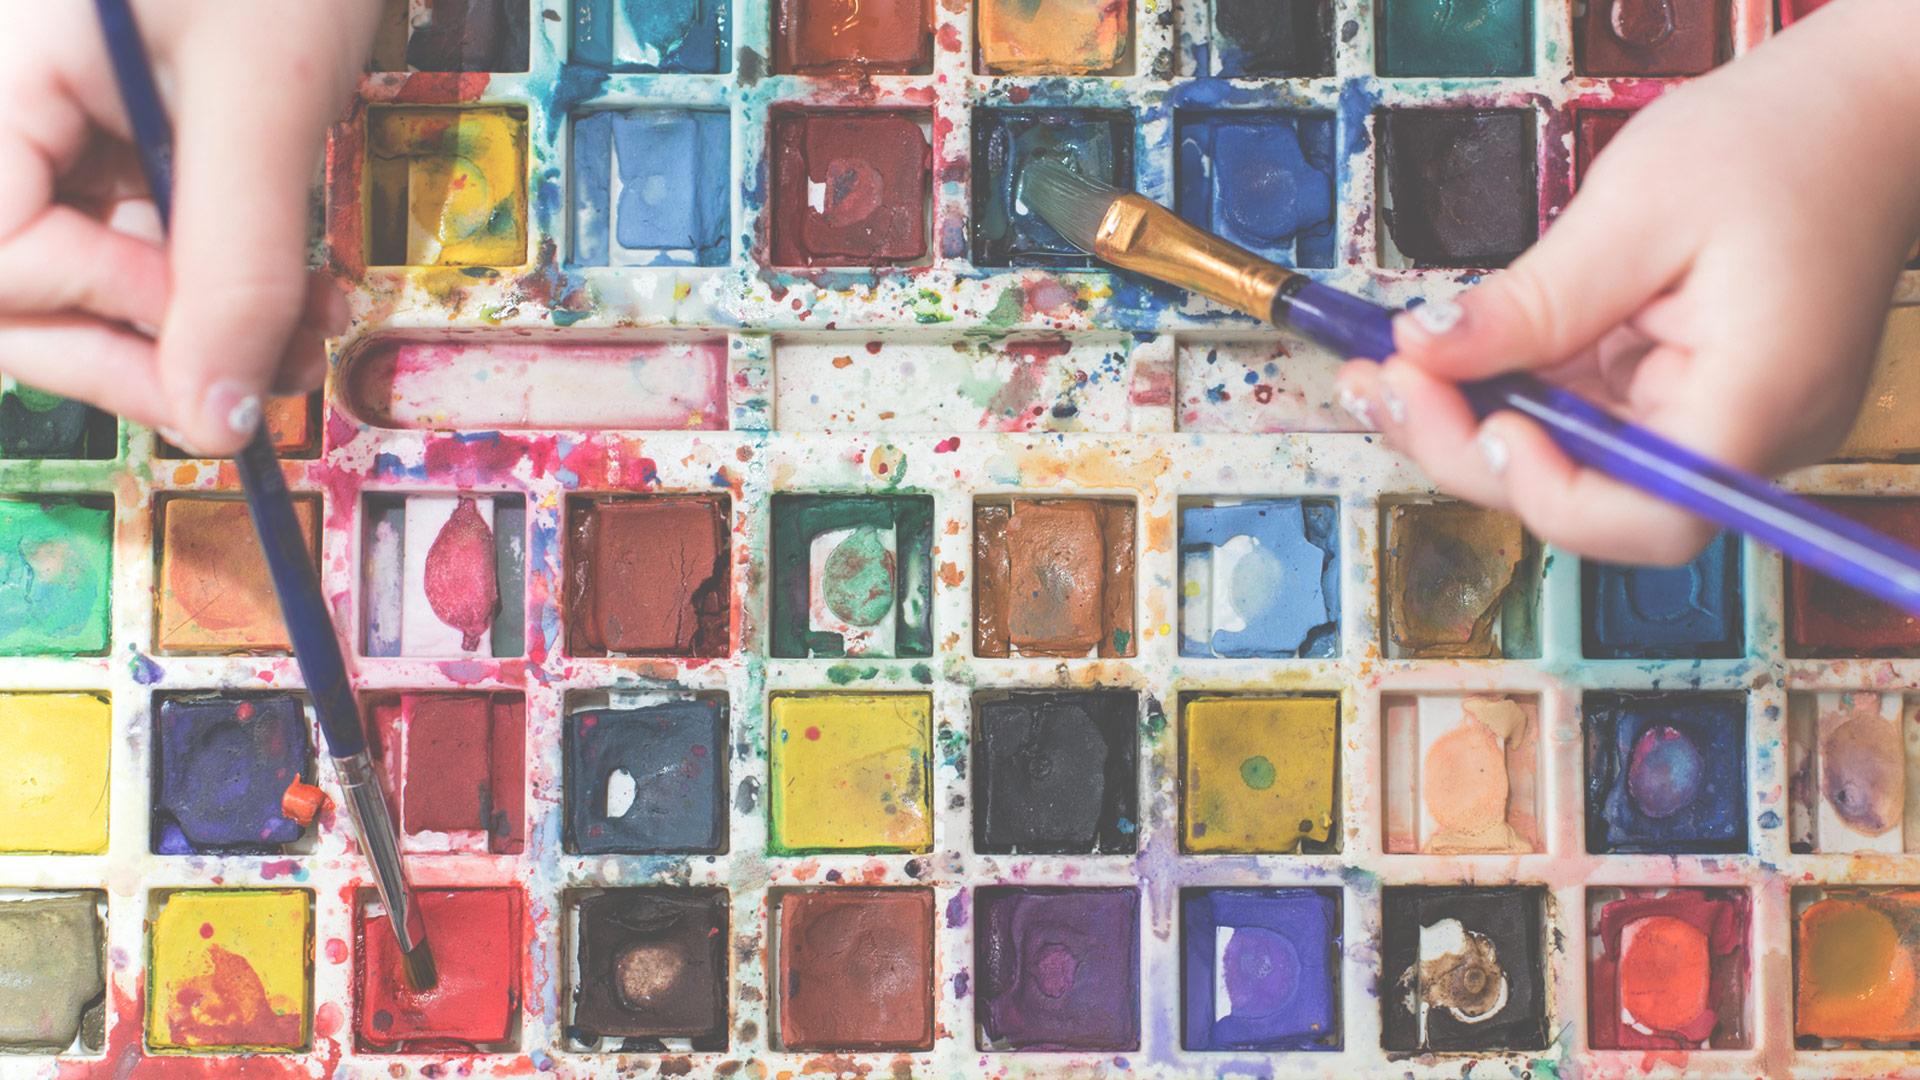 Kids using water color paints